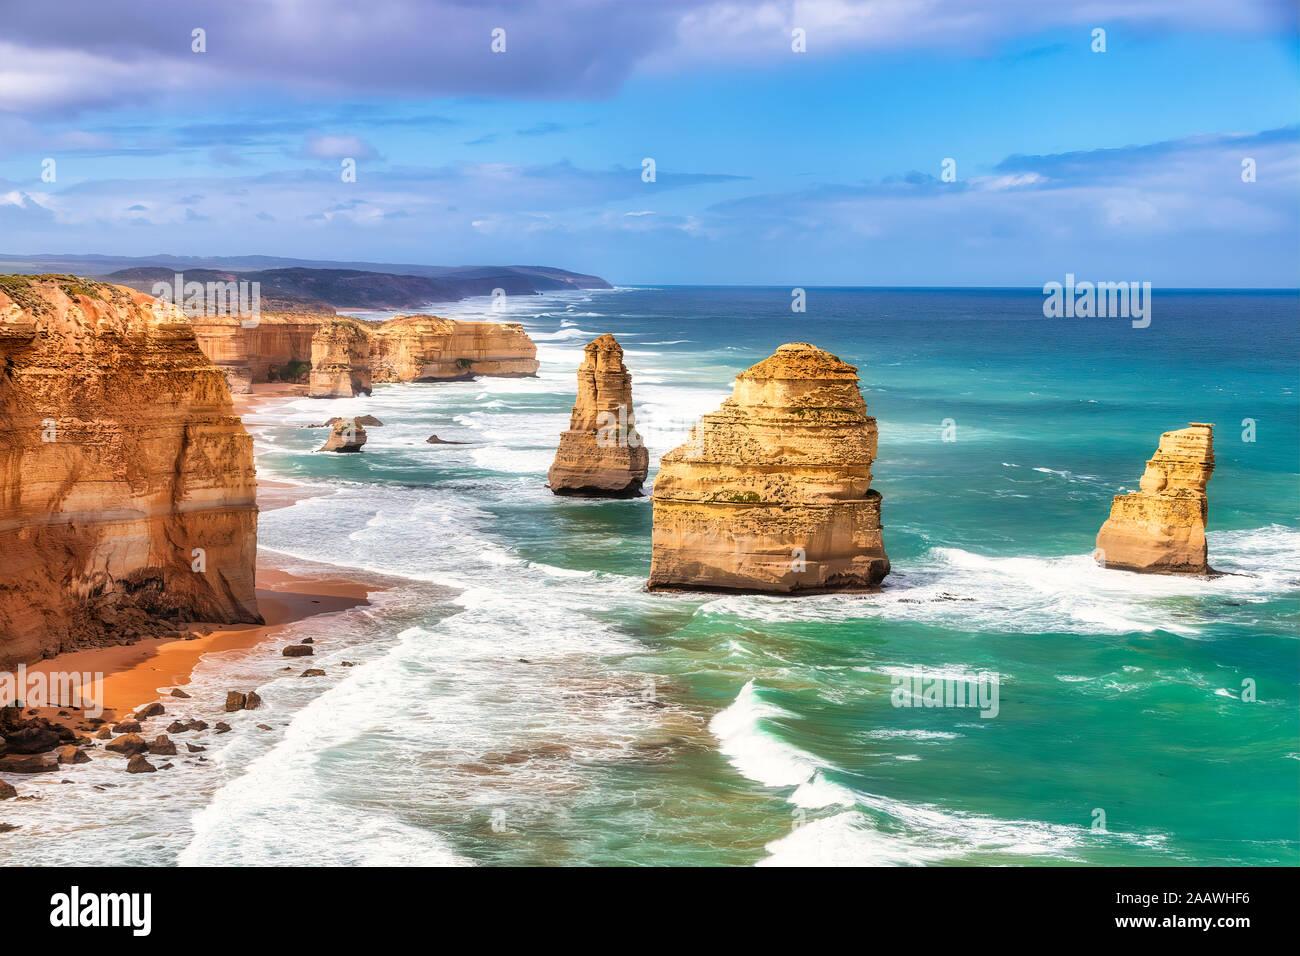 Stack rocks against sky at Twelve Apostles Marine National Park, Victoria, Australia Stock Photo